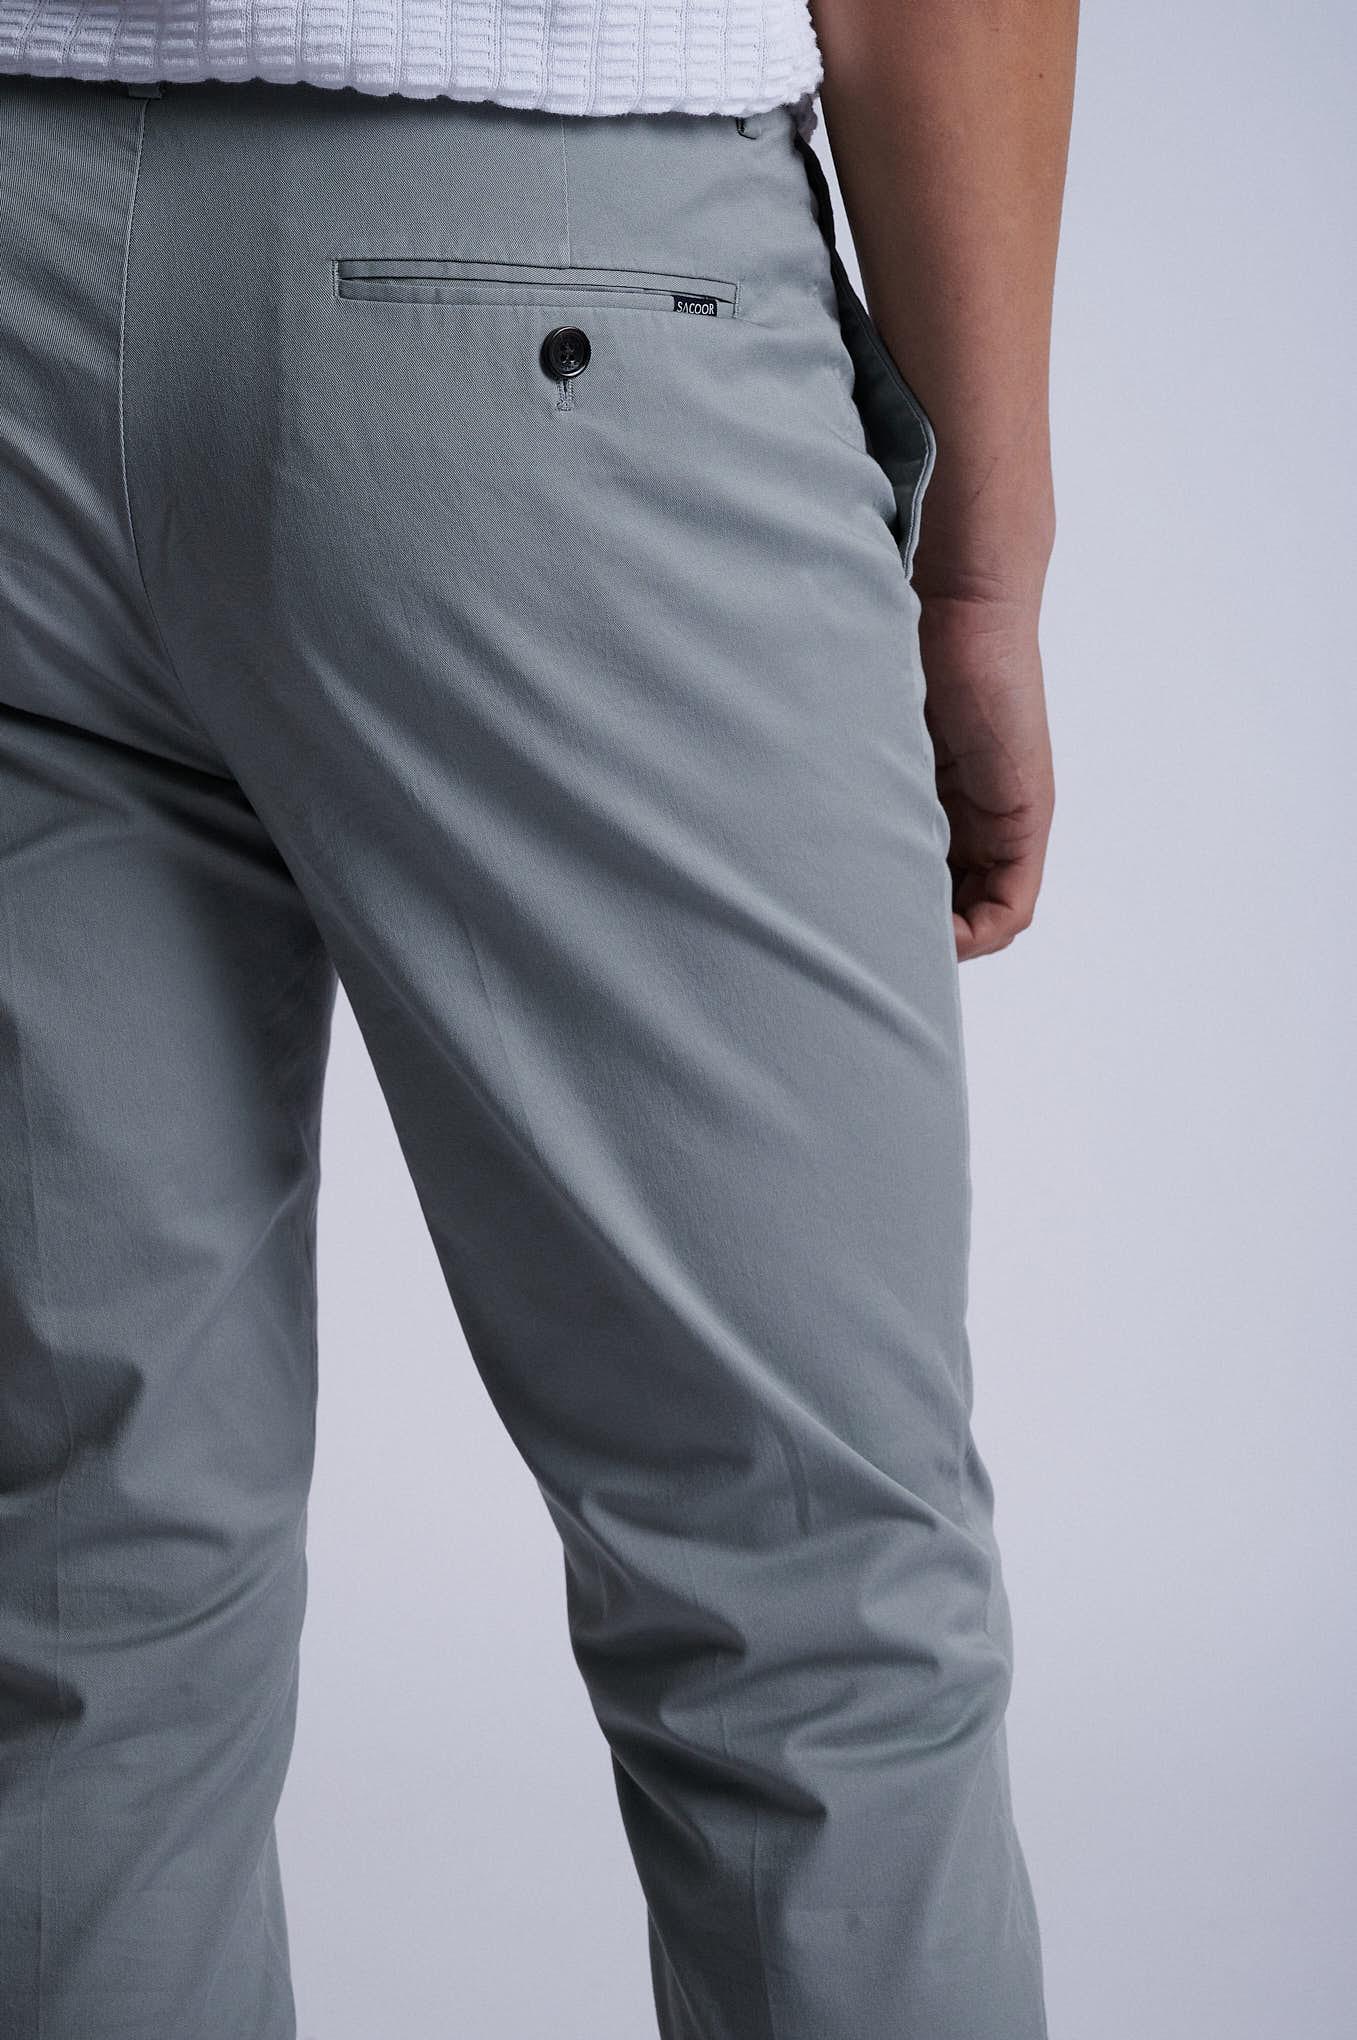 Chino Trousers Khaki Sport Man